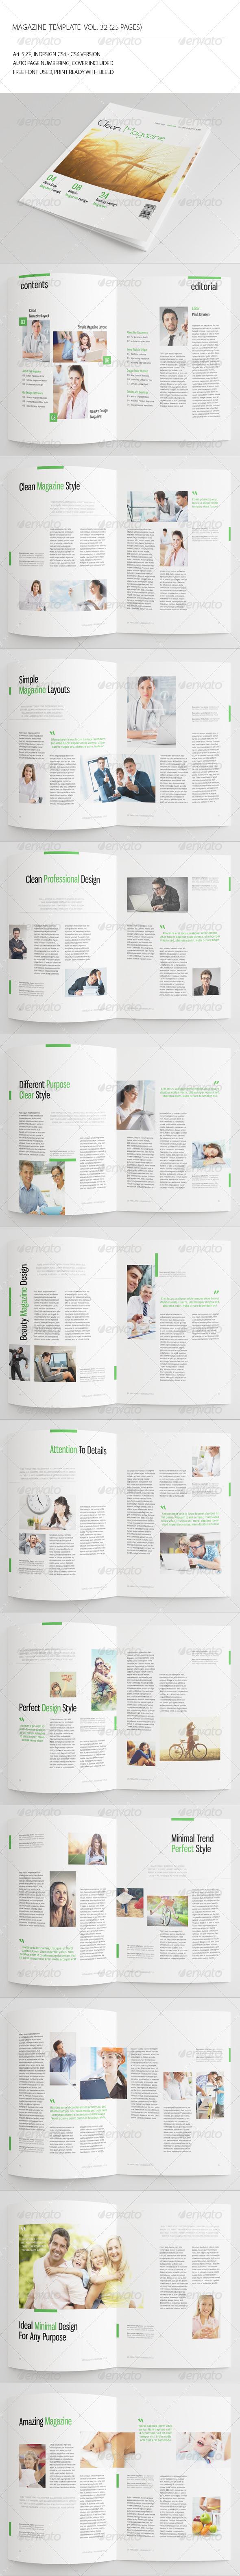 25 Pages Minimal Magazine Vol32 - Magazines Print Templates